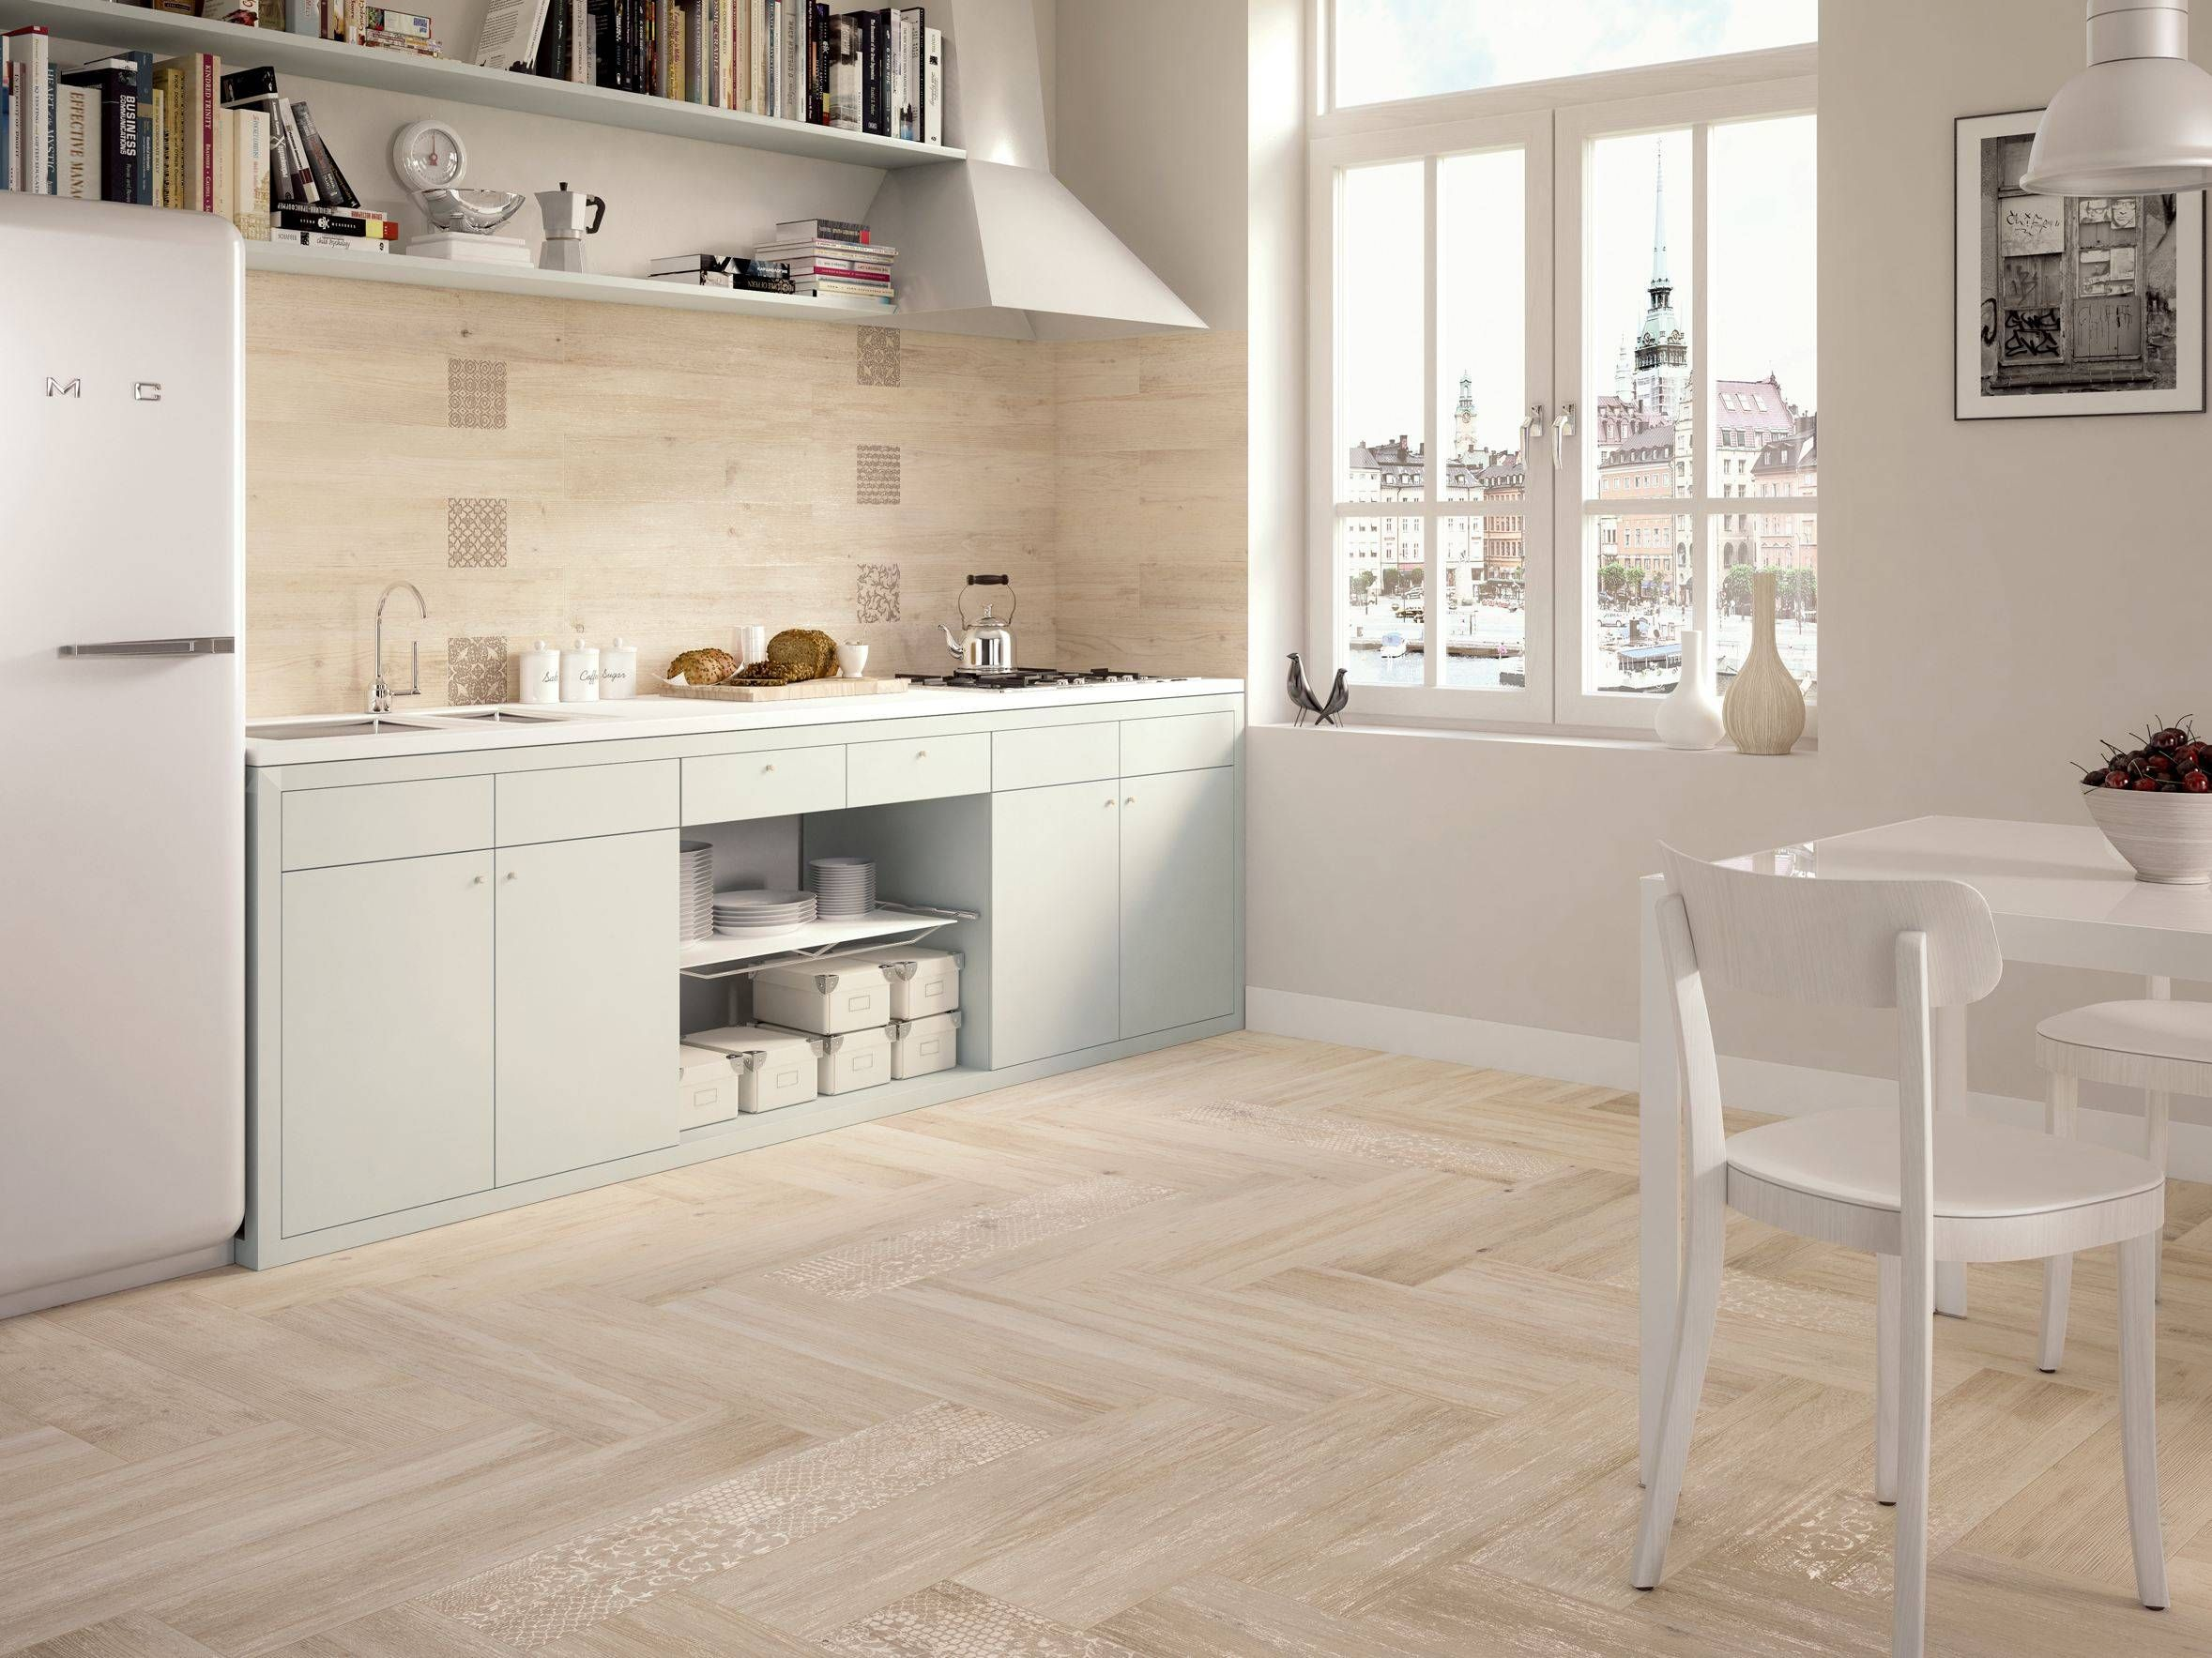 Gres porcellanato effetto parquet home sweet home kitchen